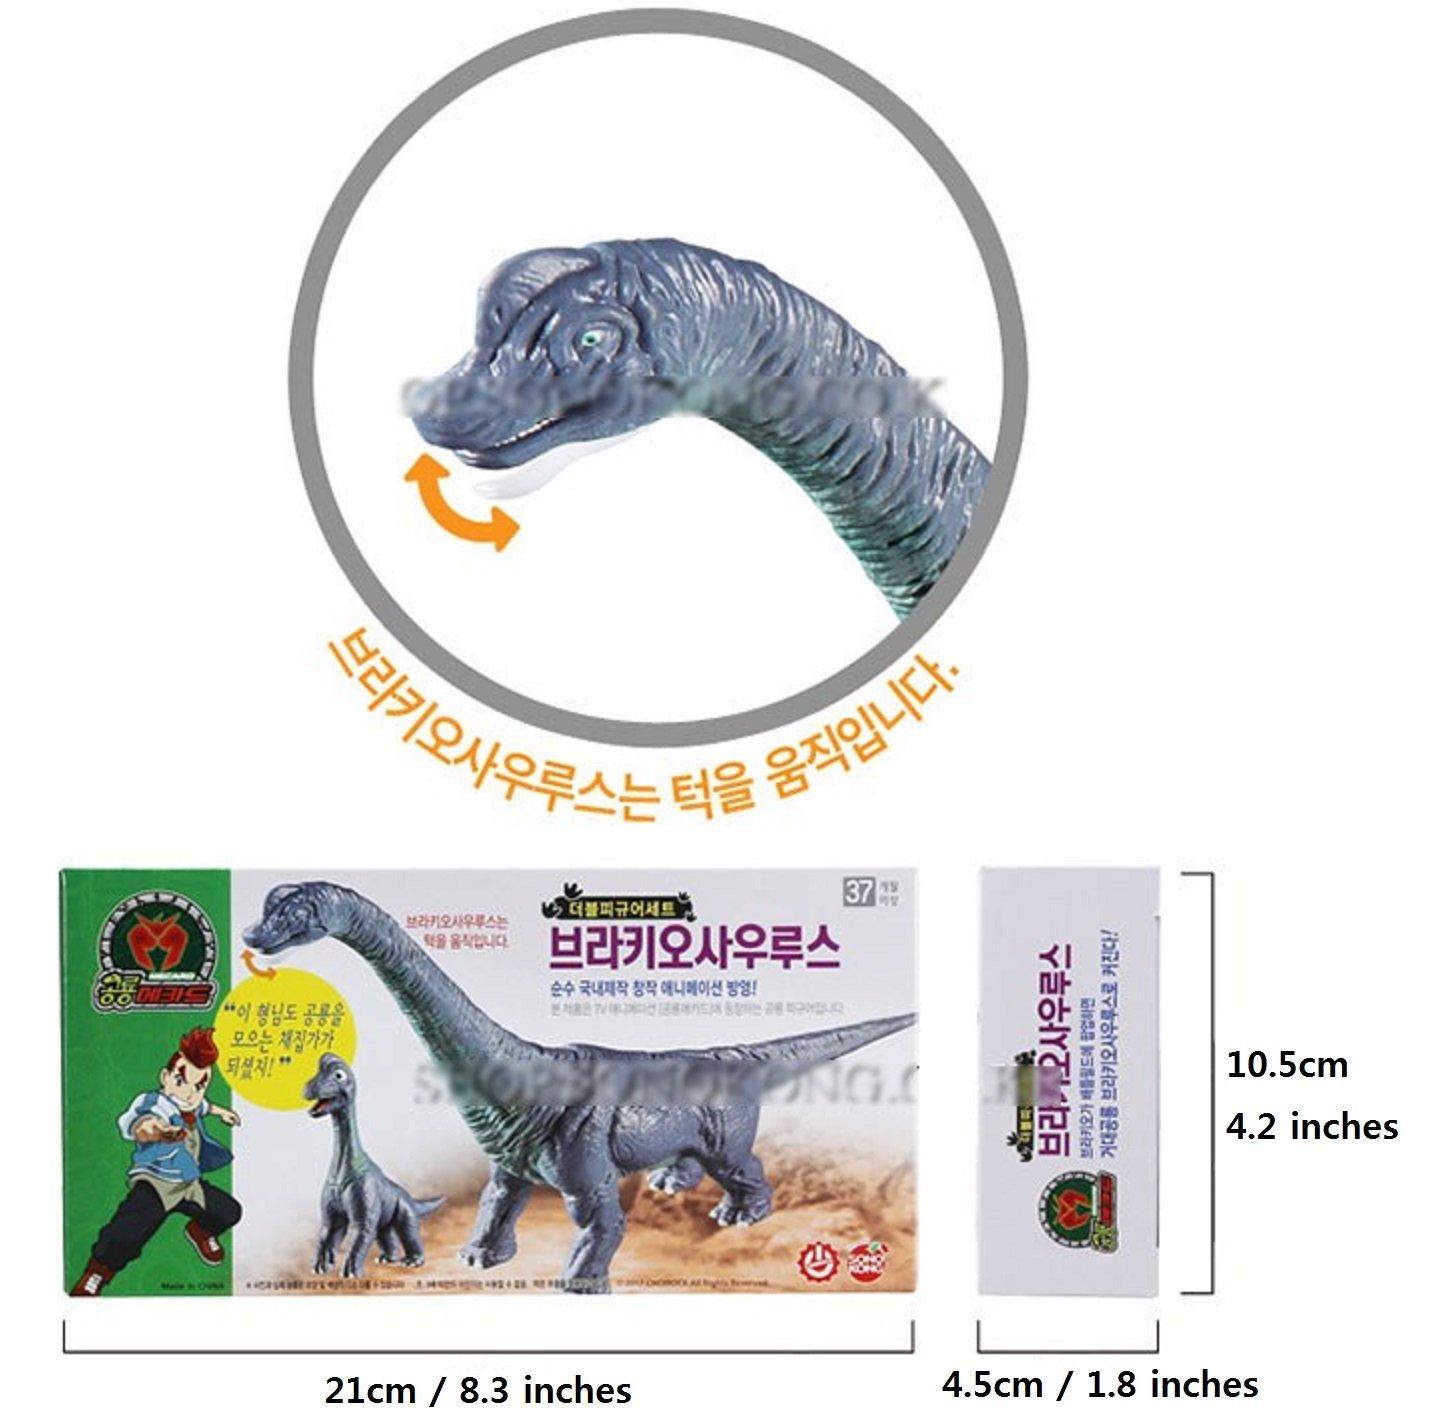 Dino Mecard Double Figure Set Brachiosaurus and Tinysour BRACHIO Sonokong